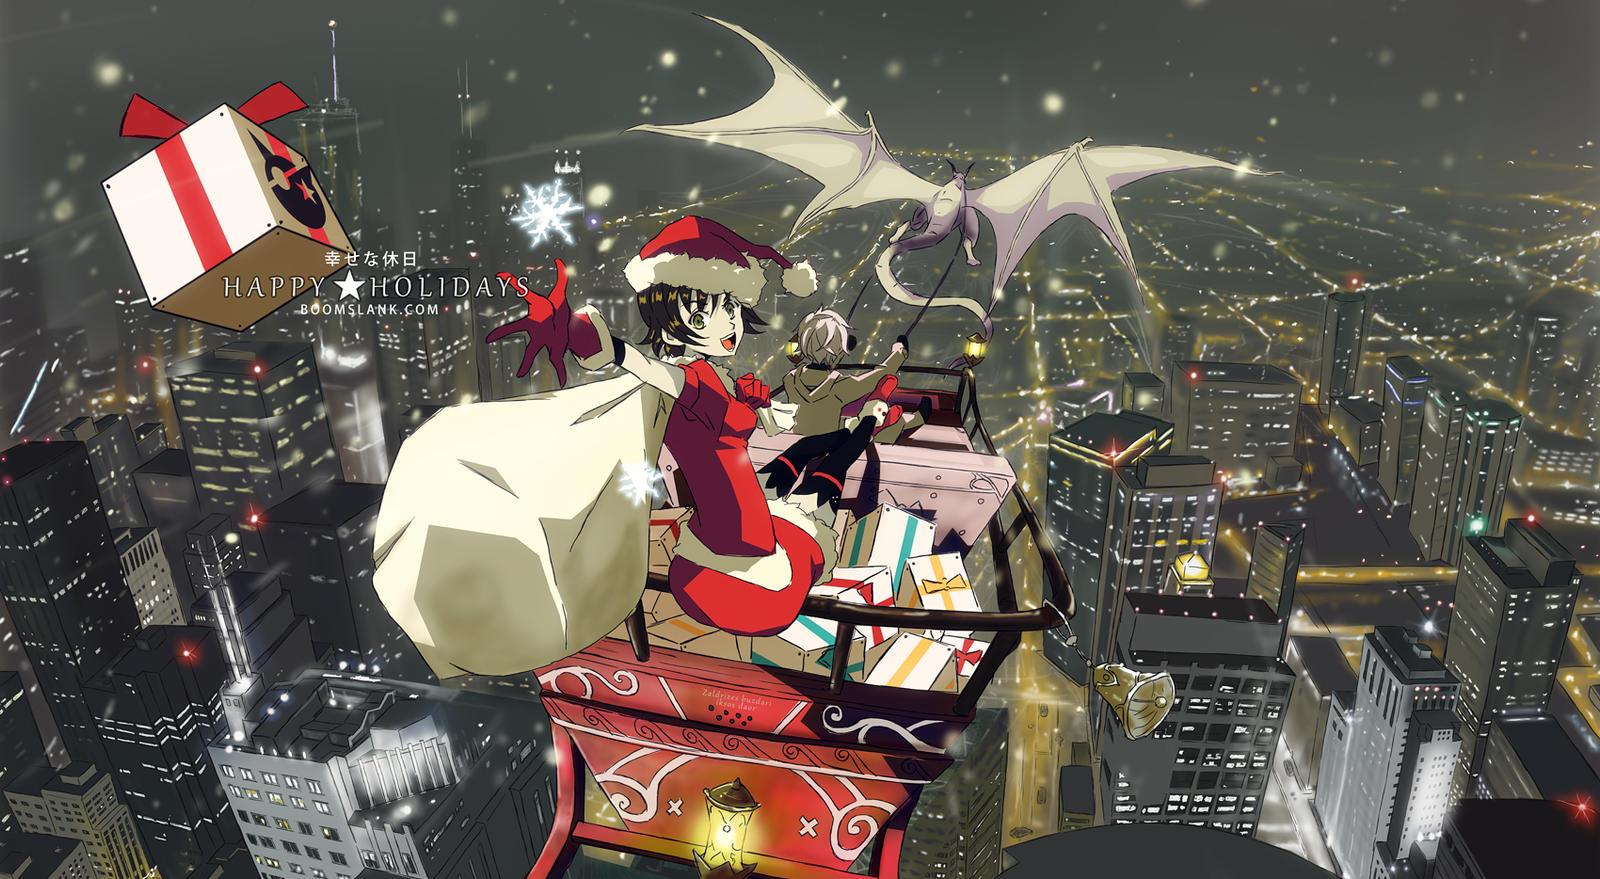 Happy Holidays 2013 by P-Shinobi